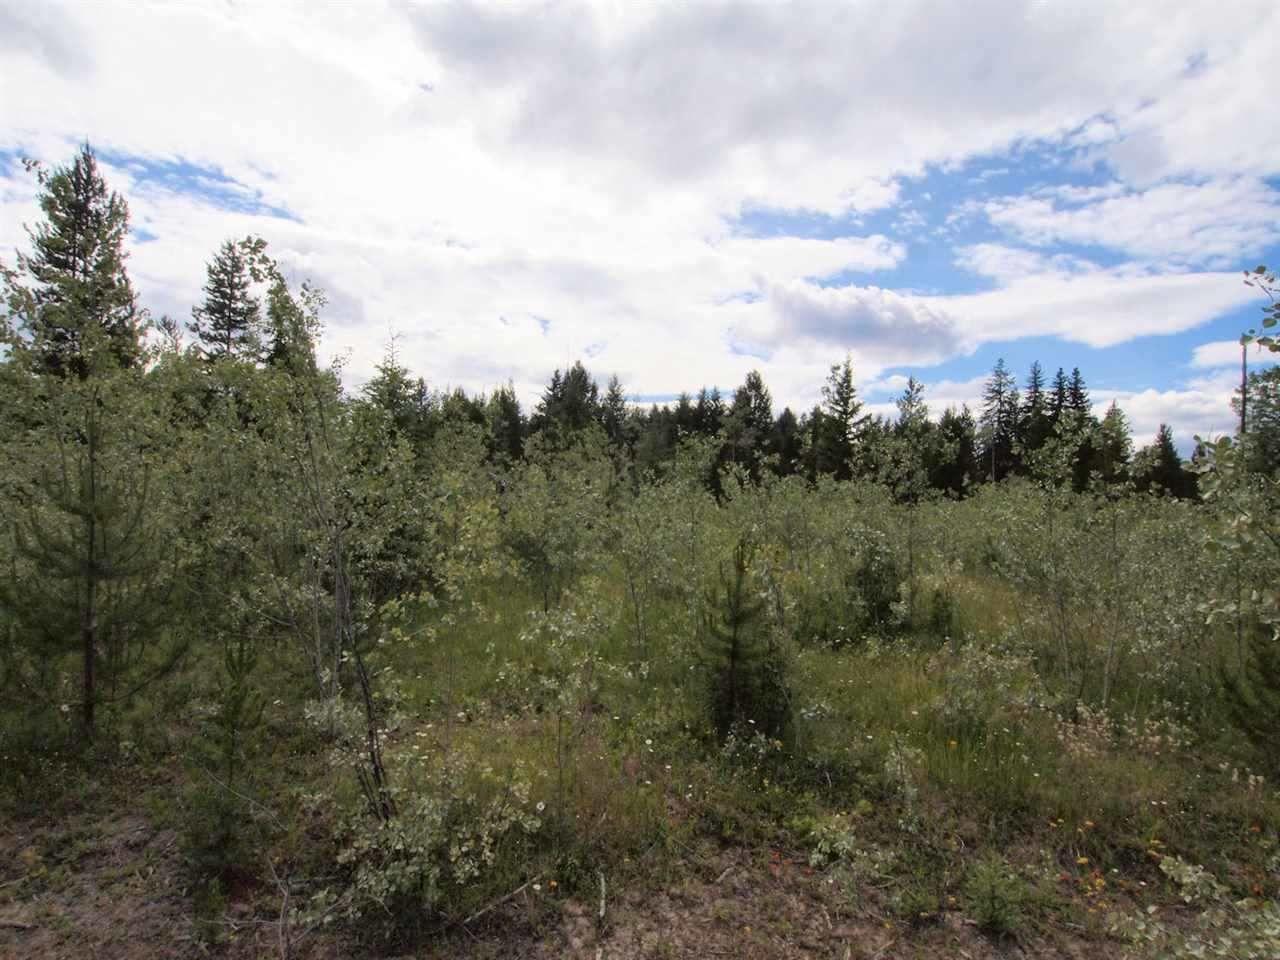 Photo 10: Photos: 4573 BAKKEN Road: Forest Grove Land for sale (100 Mile House (Zone 10))  : MLS®# R2377308